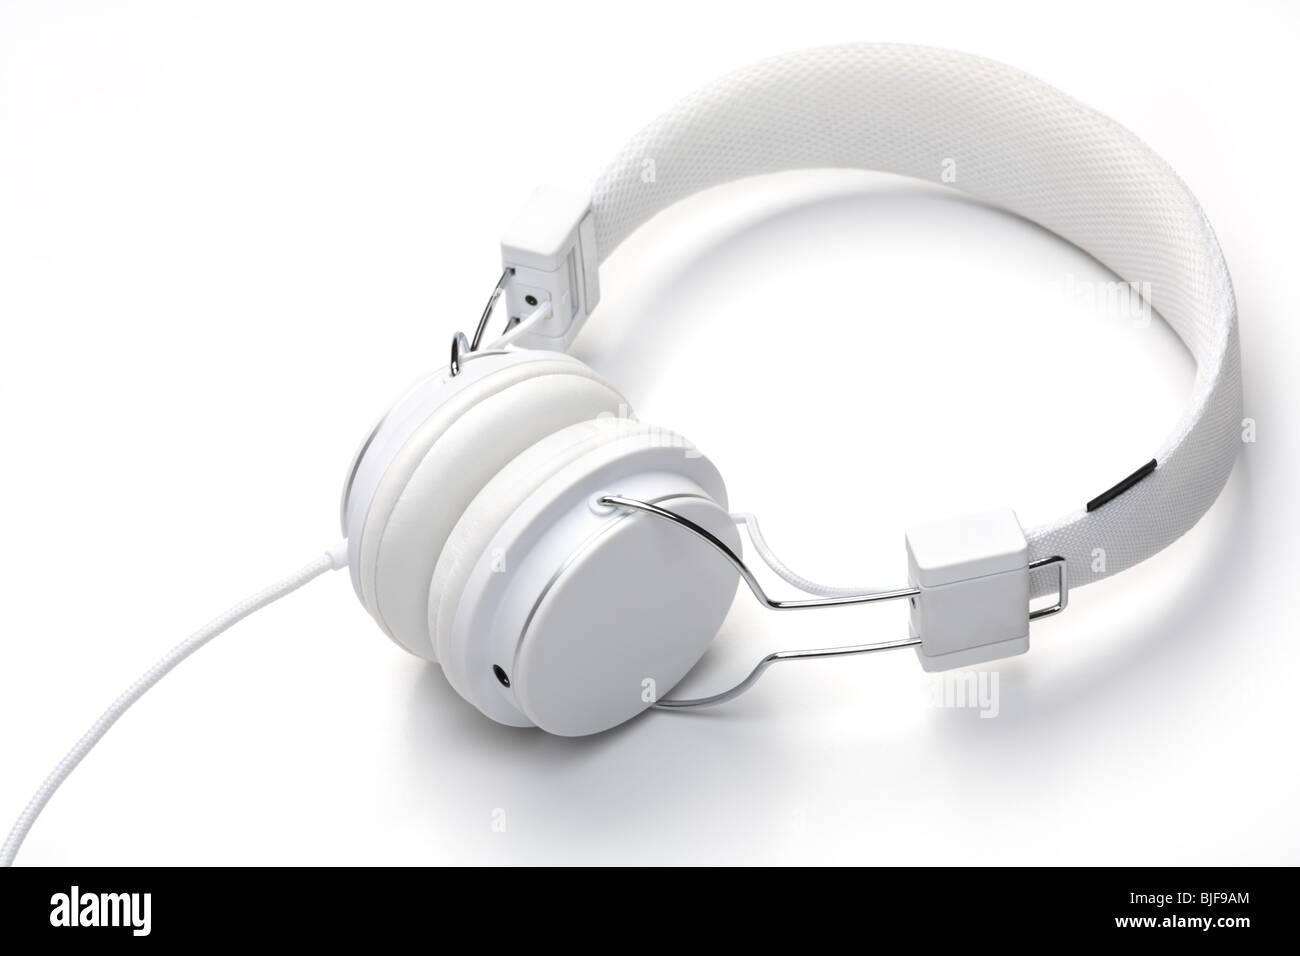 White elegance headfones isolated on white background. White on white series. - Stock Image